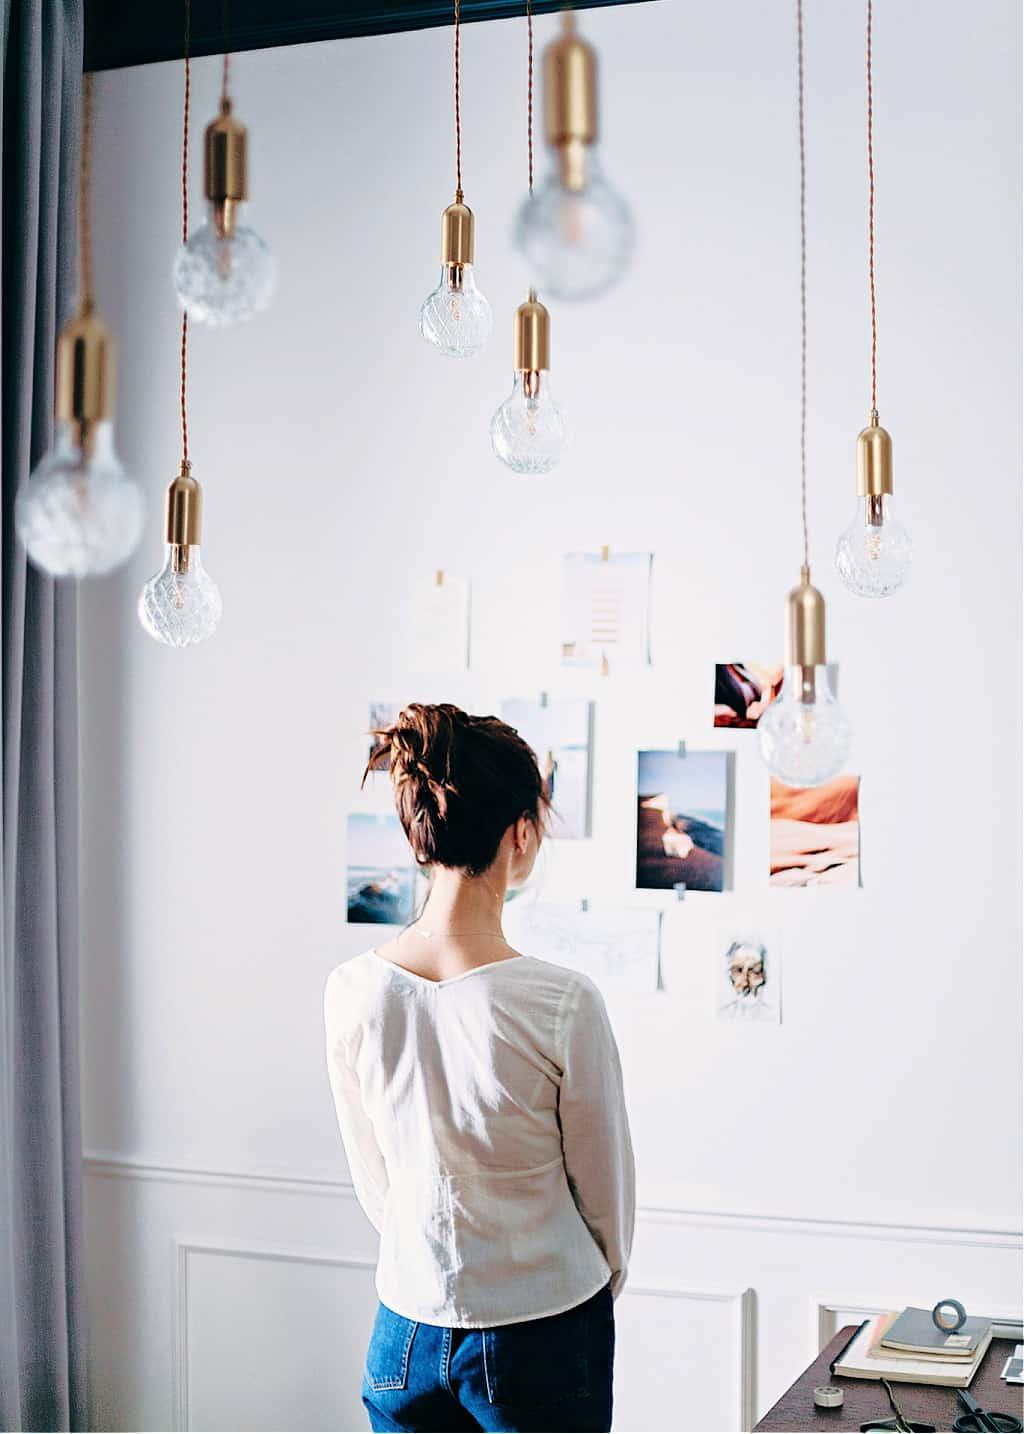 A woman looking at a vision board ideas wall